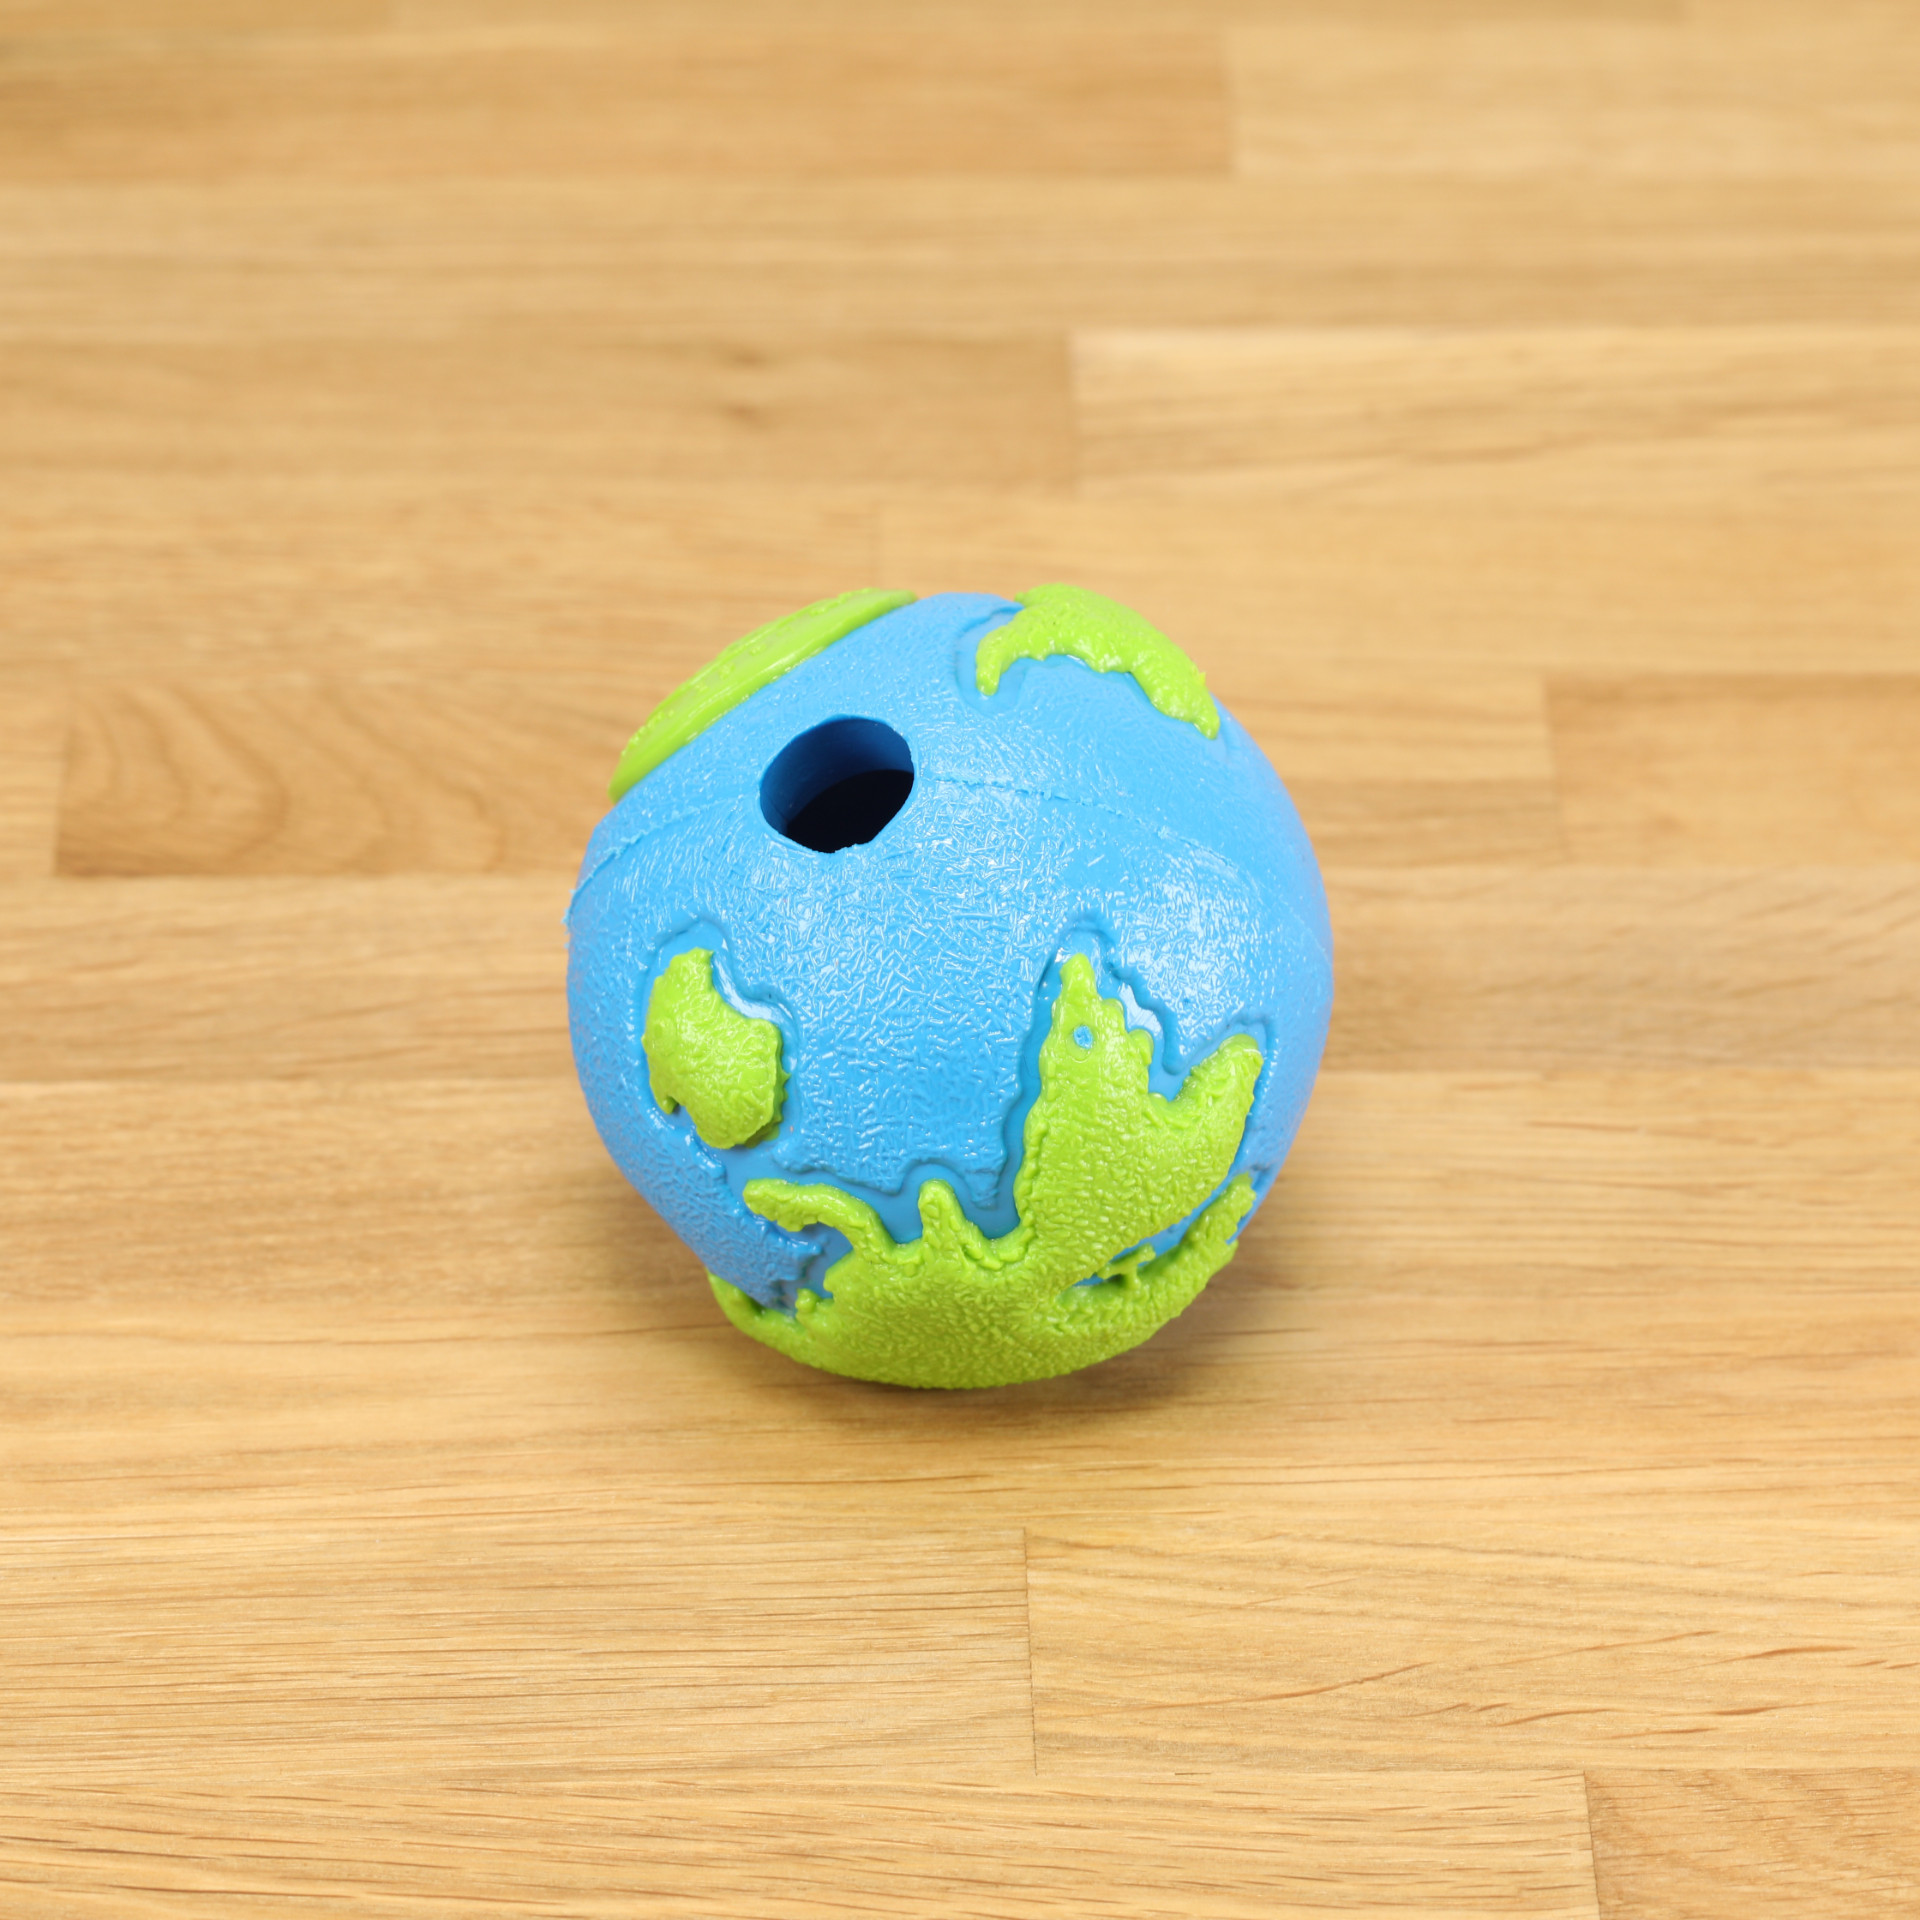 Hundespielzeug Orbee Ball blau/grün